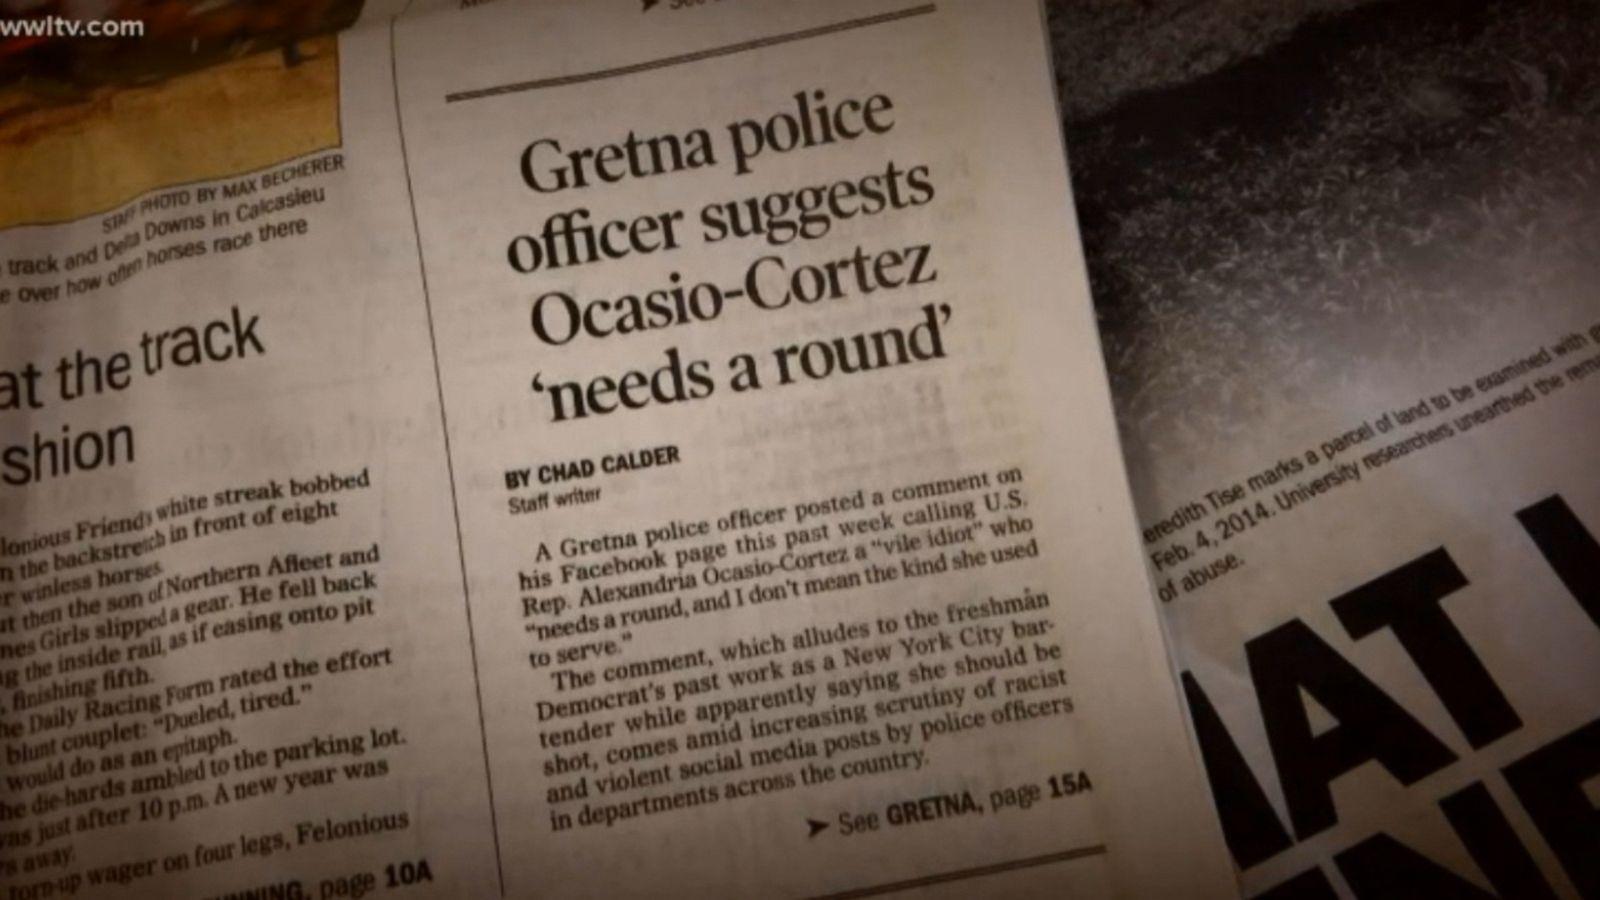 Ohio man threatens Alexandria Ocasio-Cortez on Facebook: 'She should